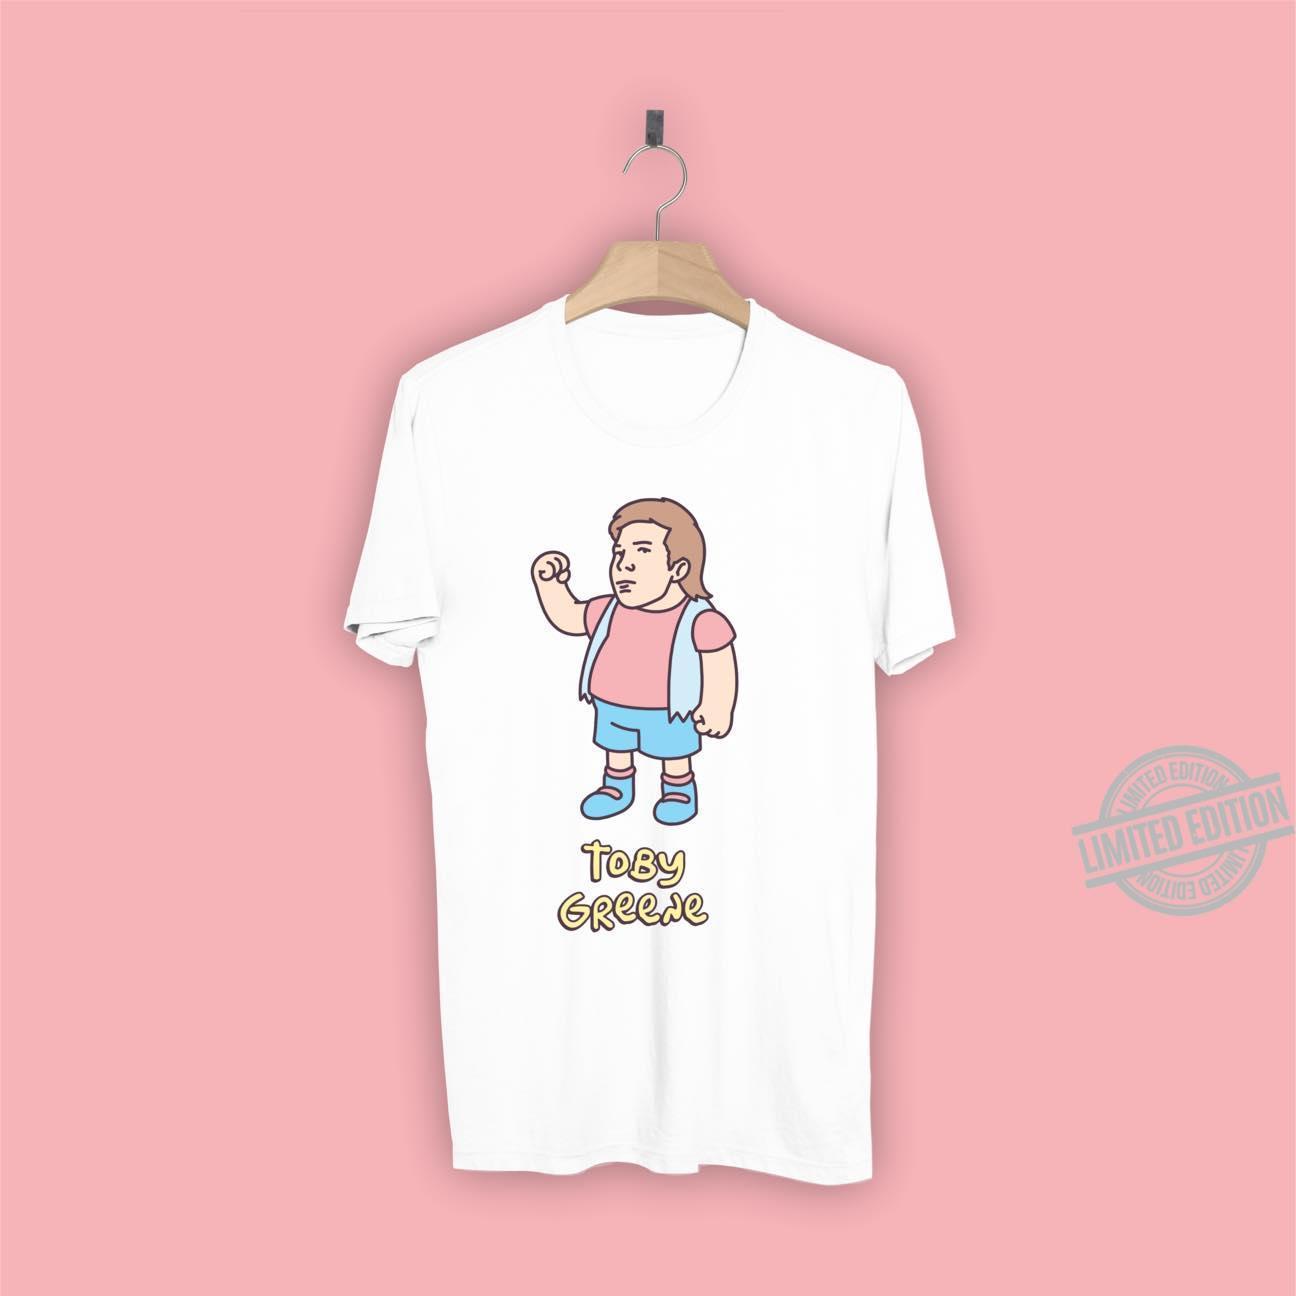 Toby Greene Shirt